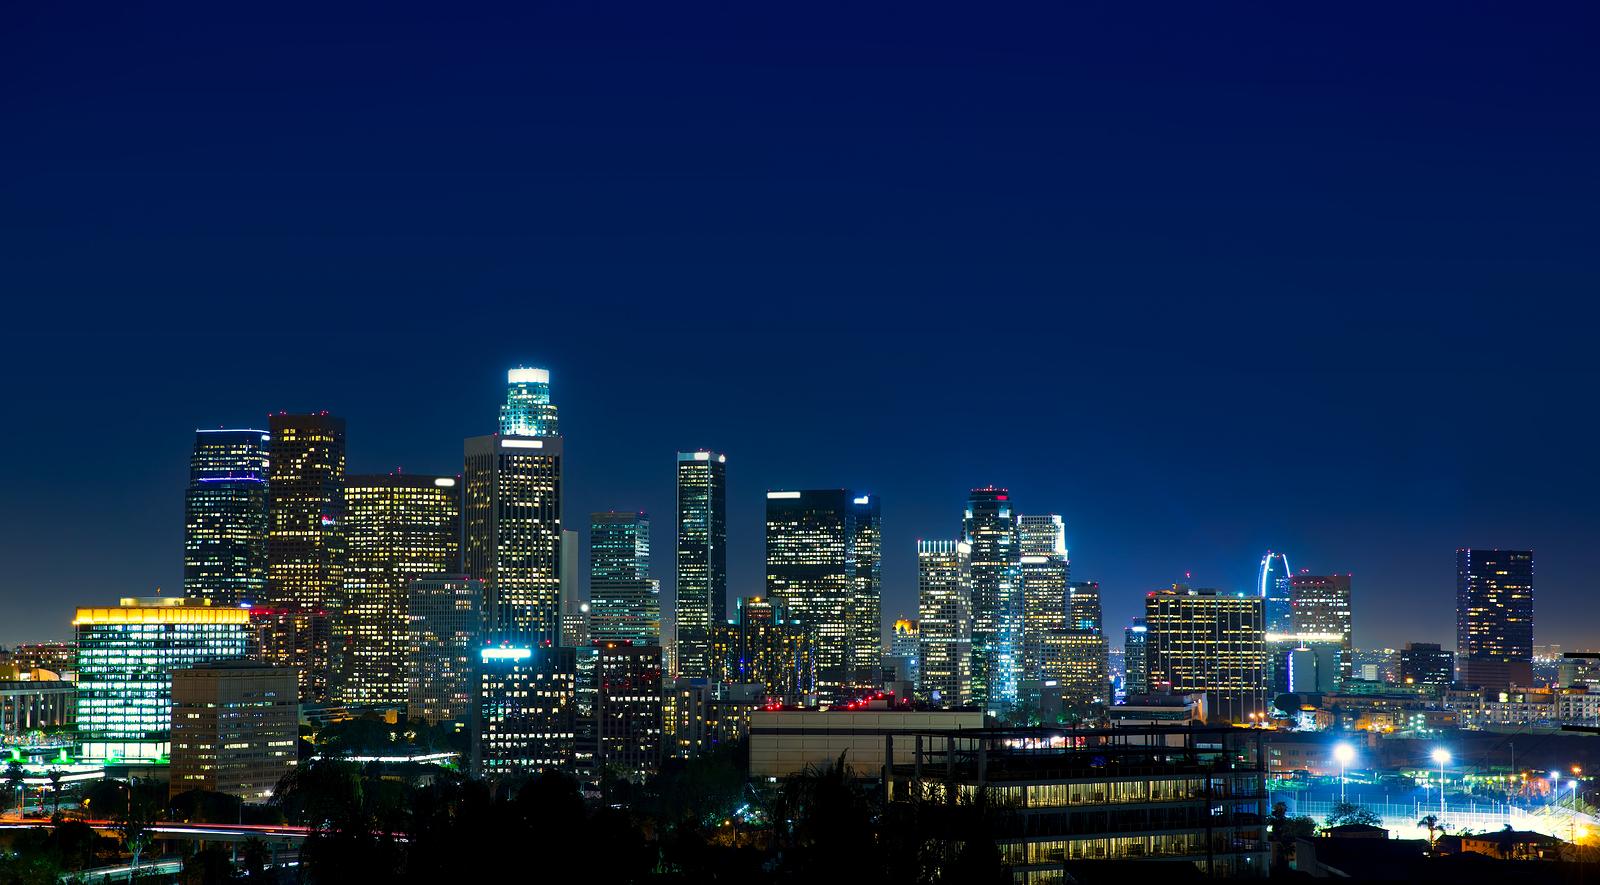 bigstock-Downtown-LA-night-Los-Angeles--52900117.jpg